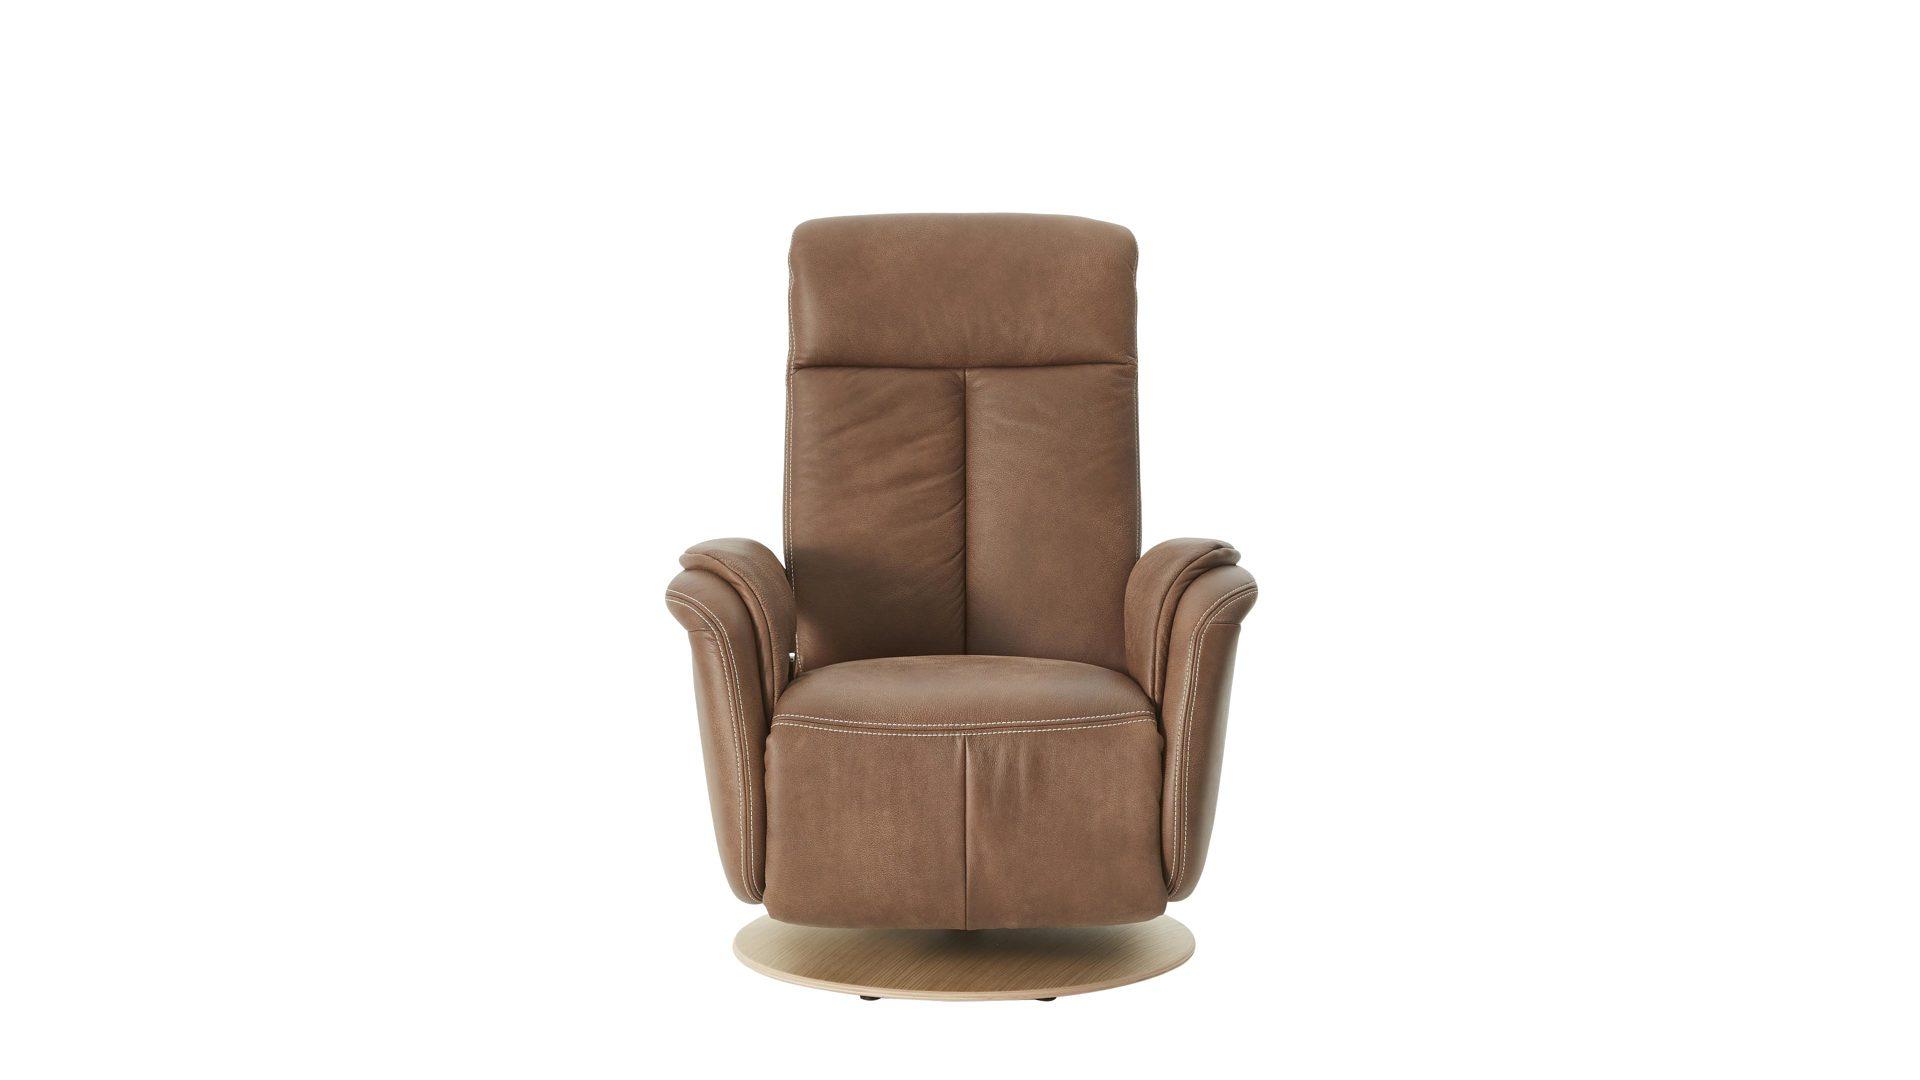 Möbel Frauendorfer Amberg Markenshops Sessel Modulmaster